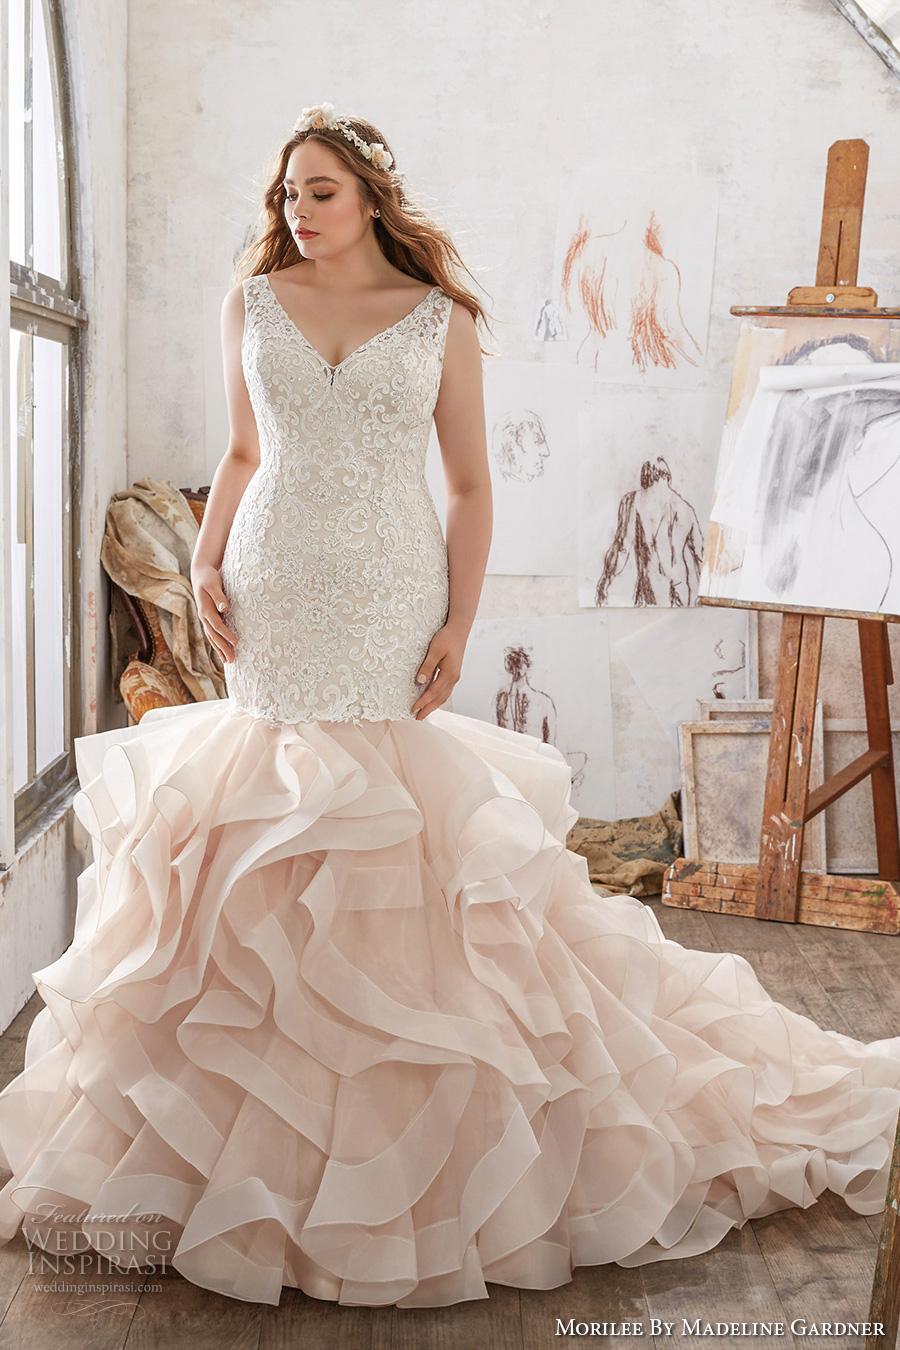 plus size wedding dresses 2017 photo - 1